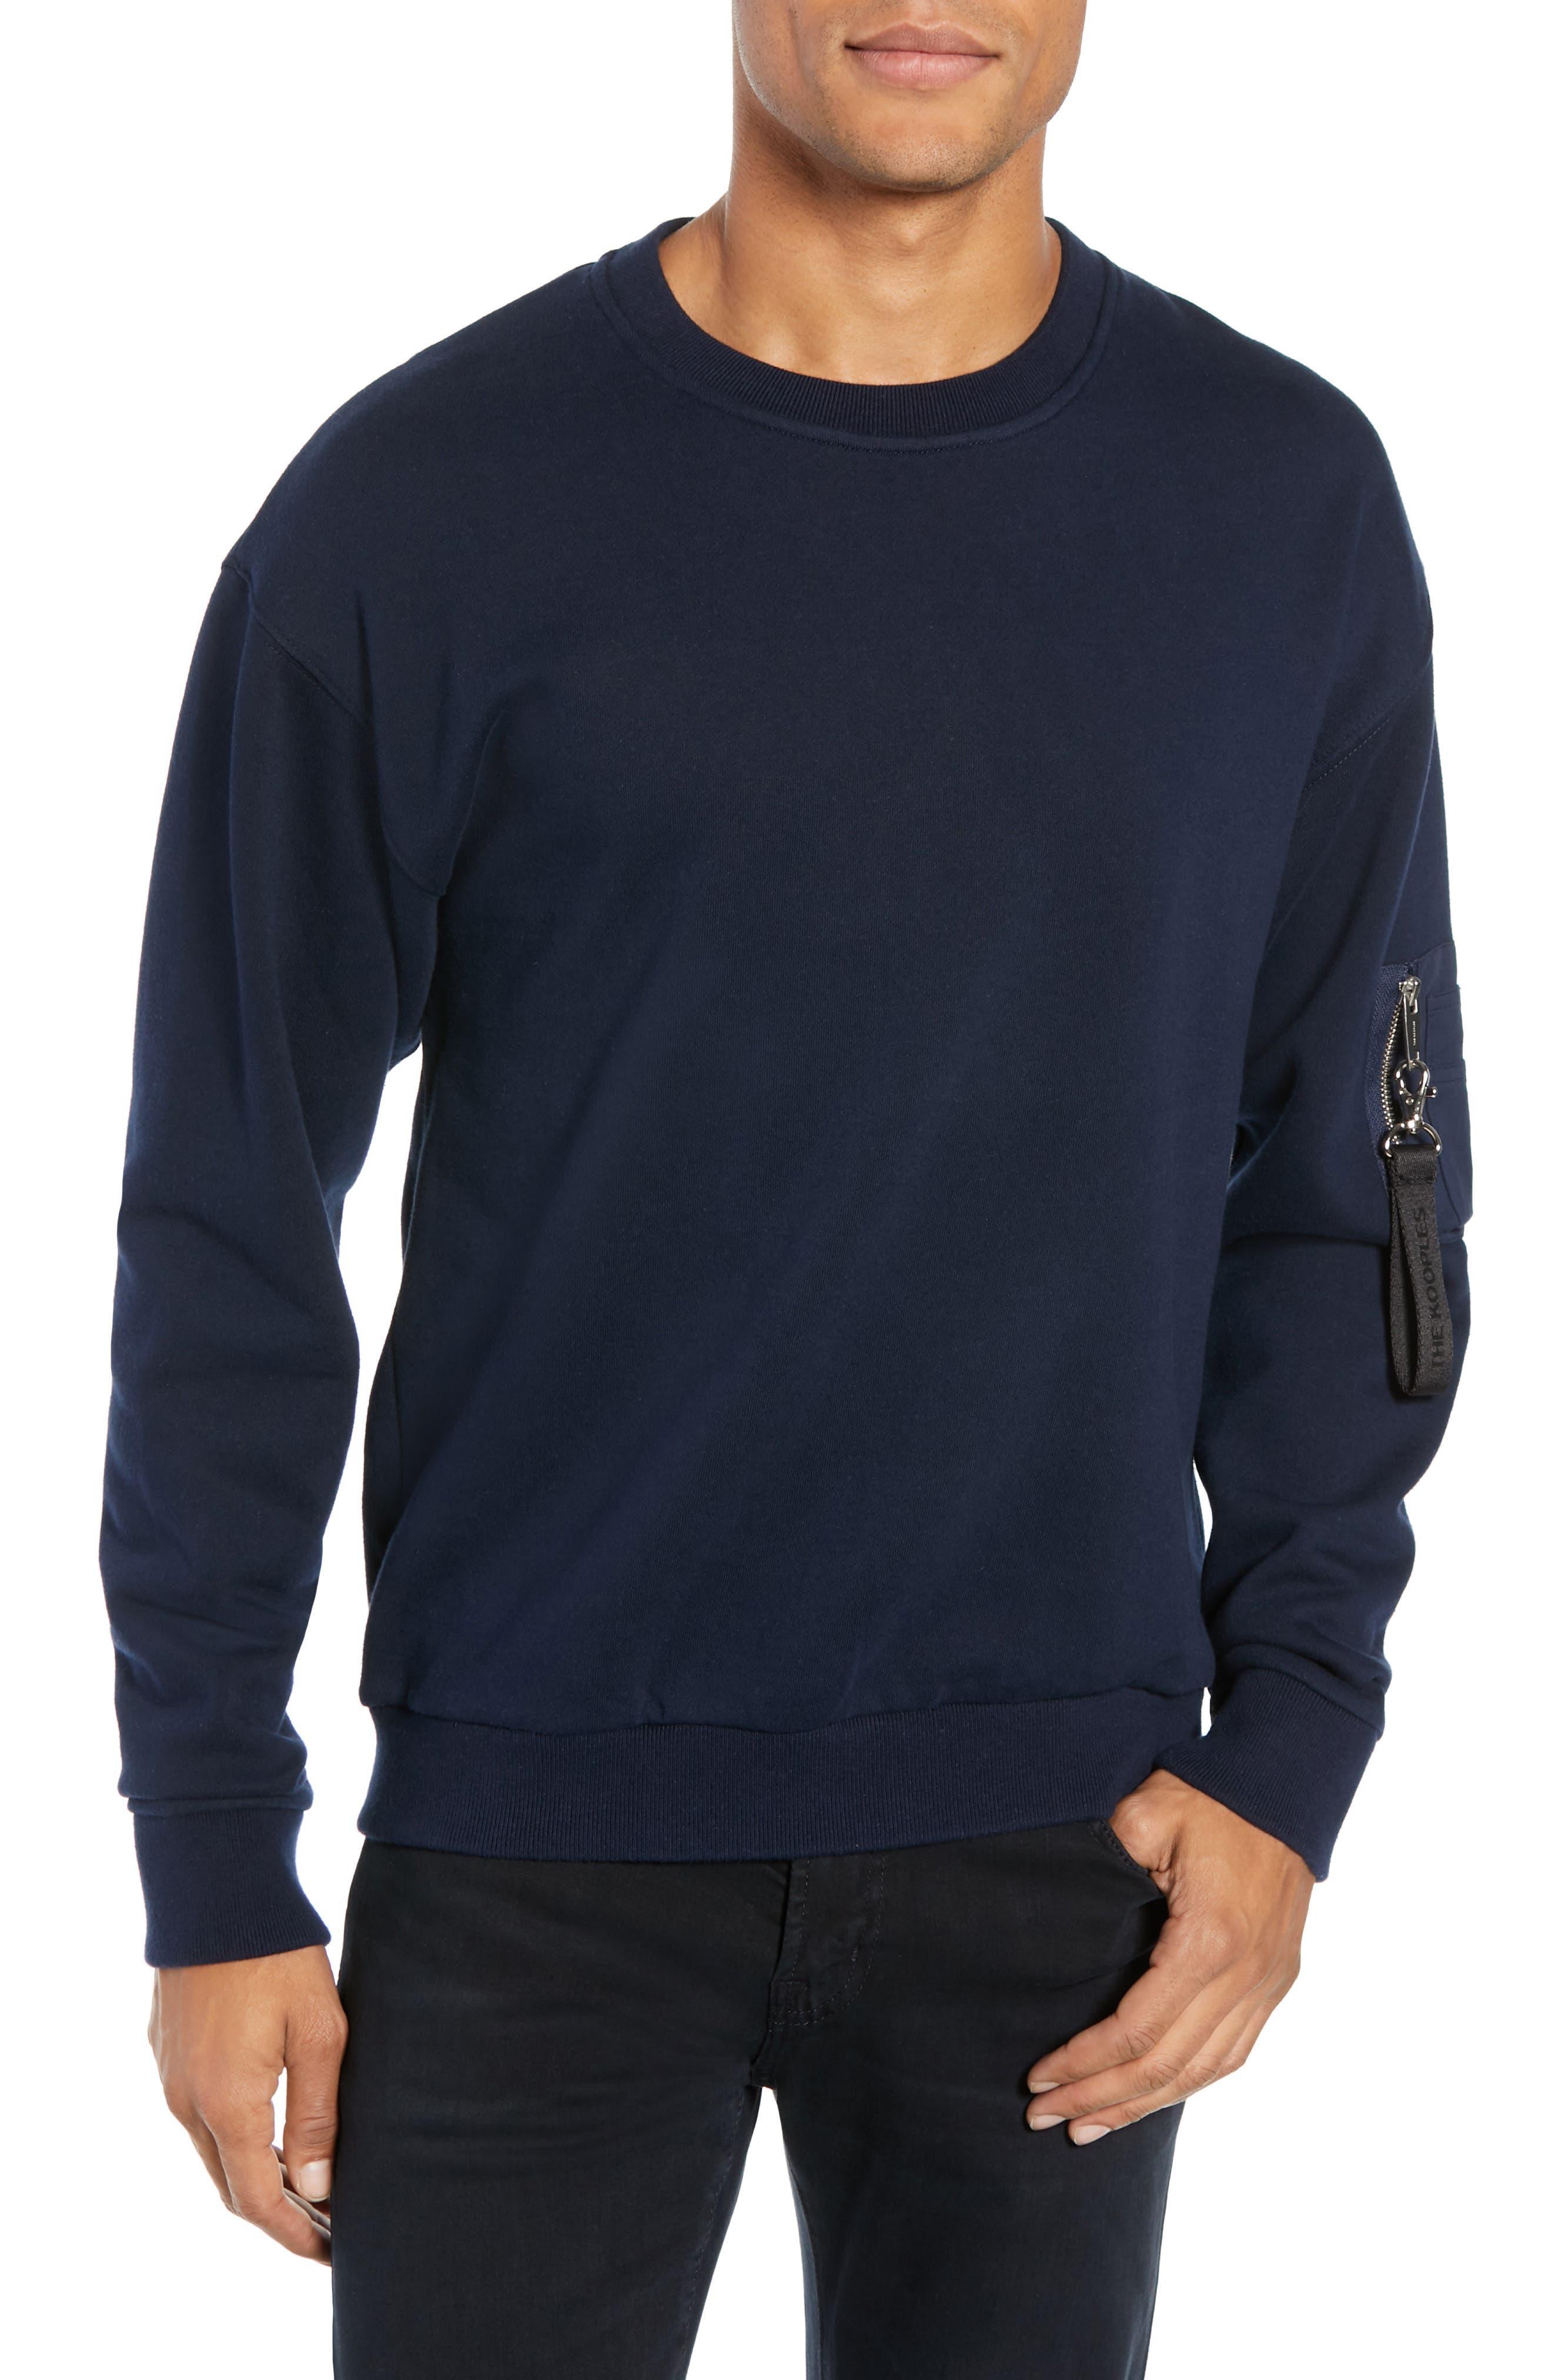 Long Sleeve Zip Pocket Sweatshirt,                             Main thumbnail 1, color,                             NAVY